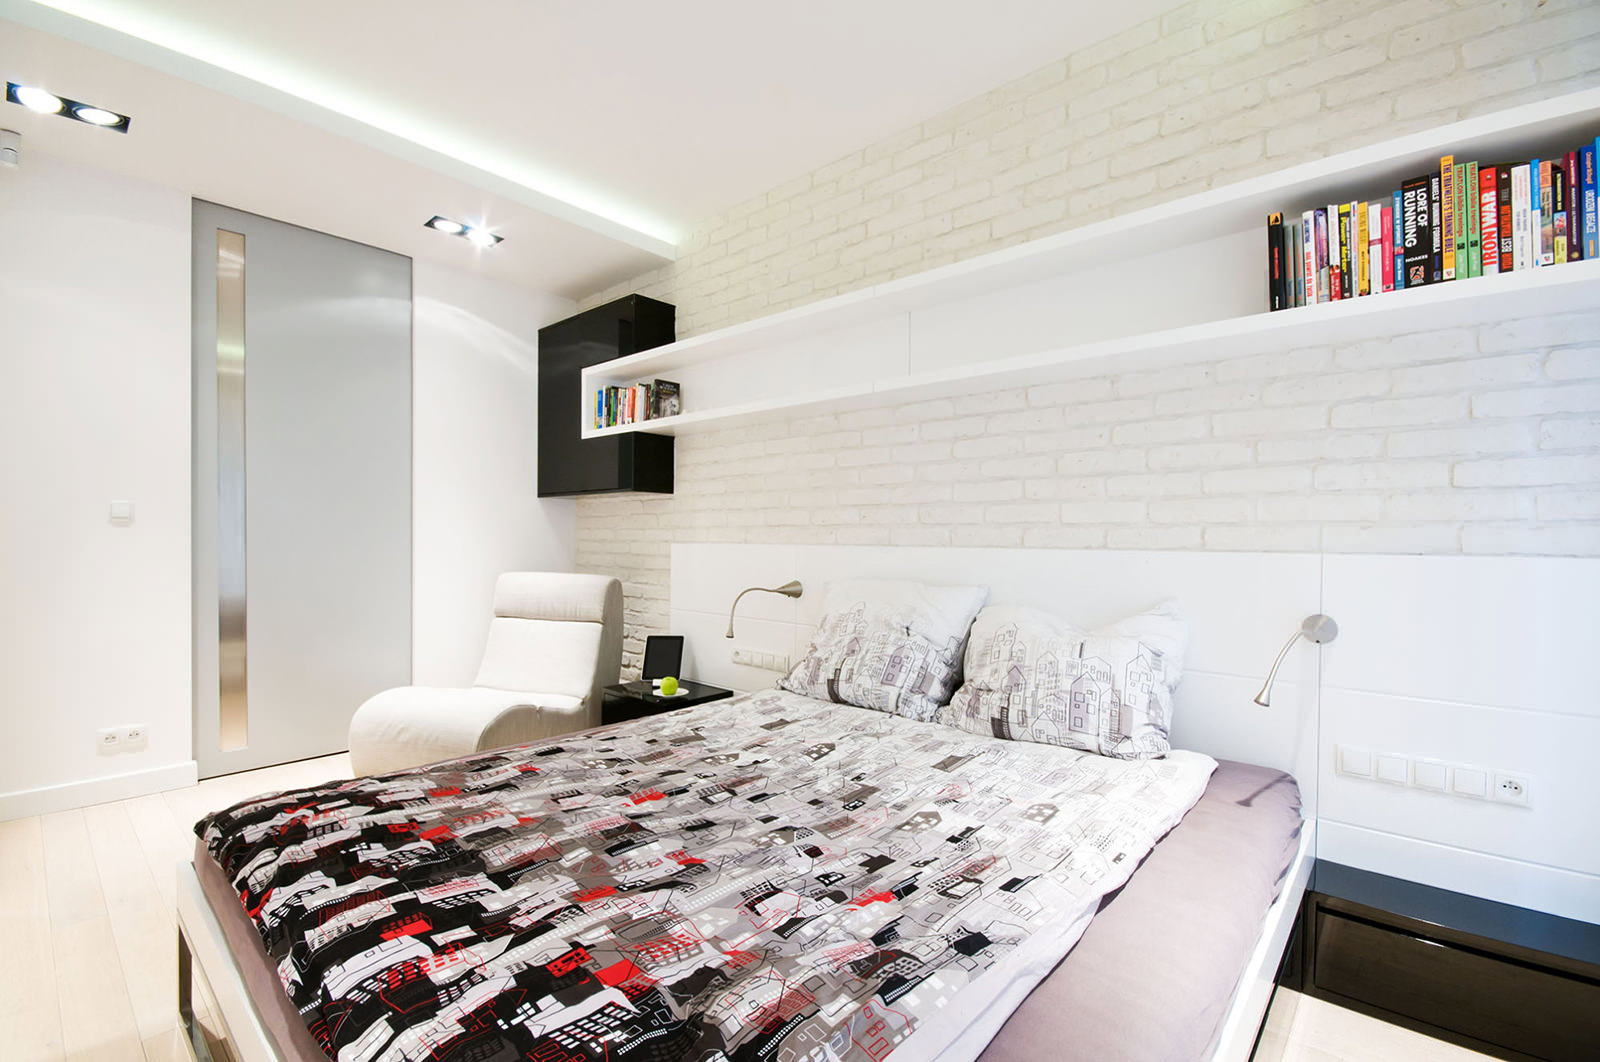 idei interera spalni s kirpichnoj stenoj 38 - Белая кирпичная стена в интерьере комнаты